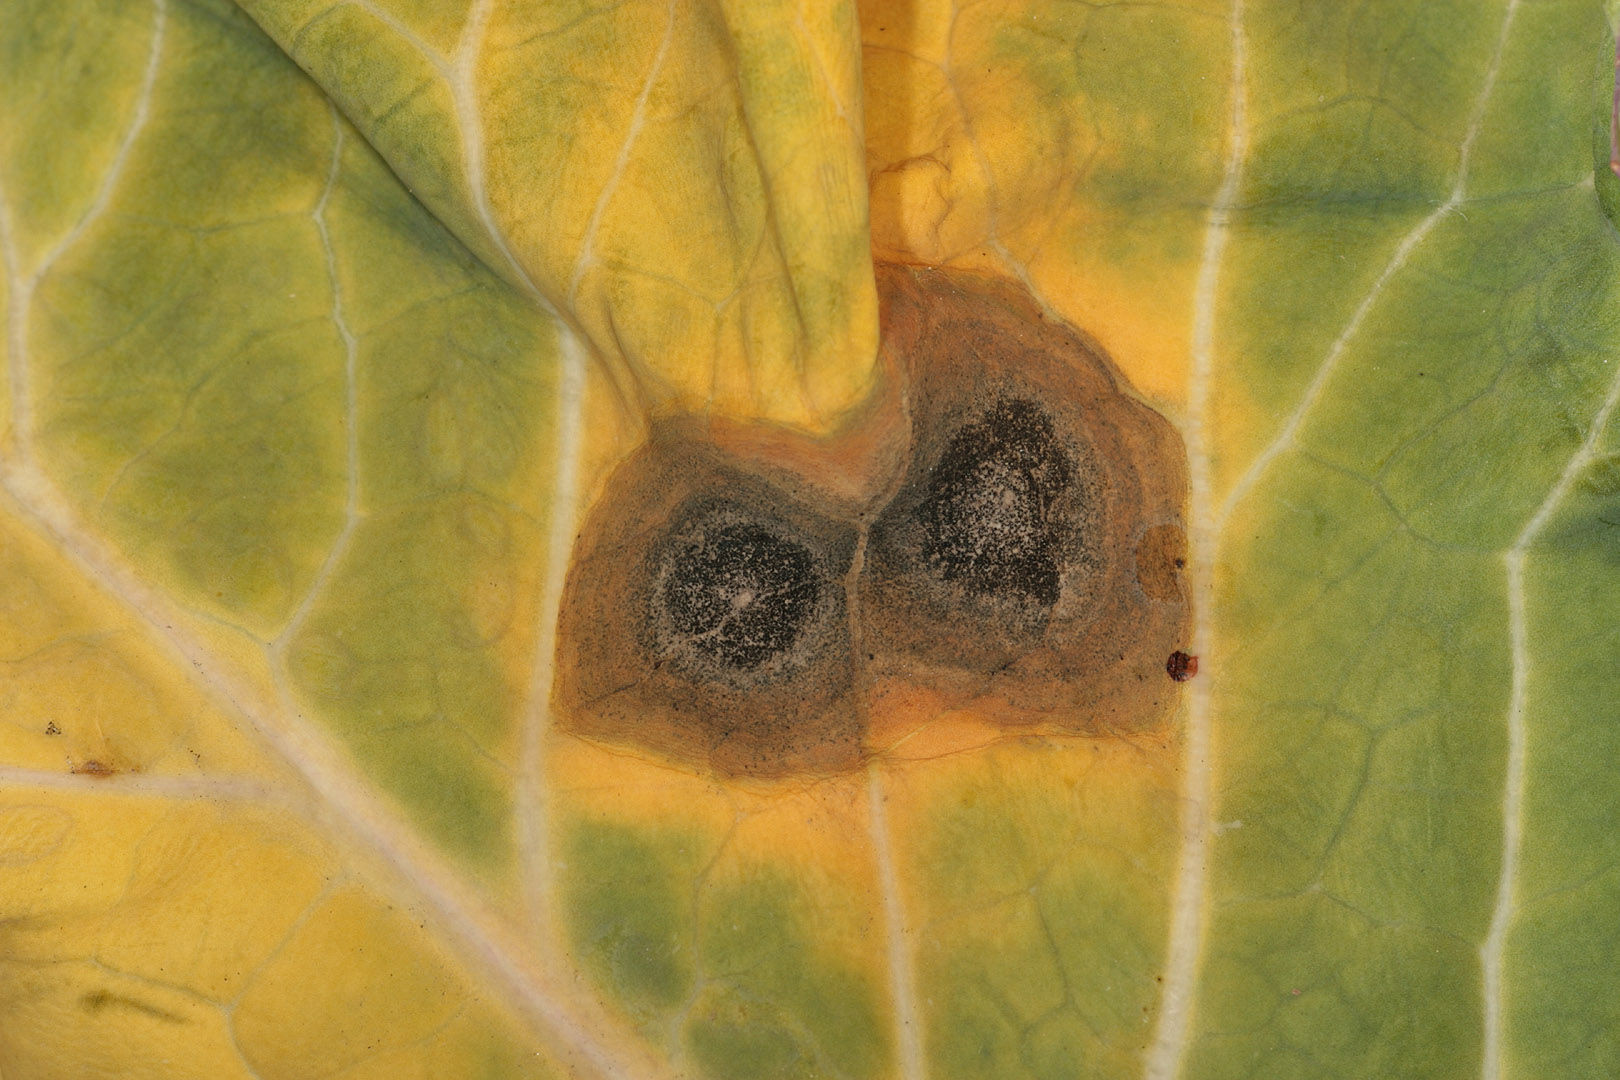 Brassica_ring_spot_2.jpg